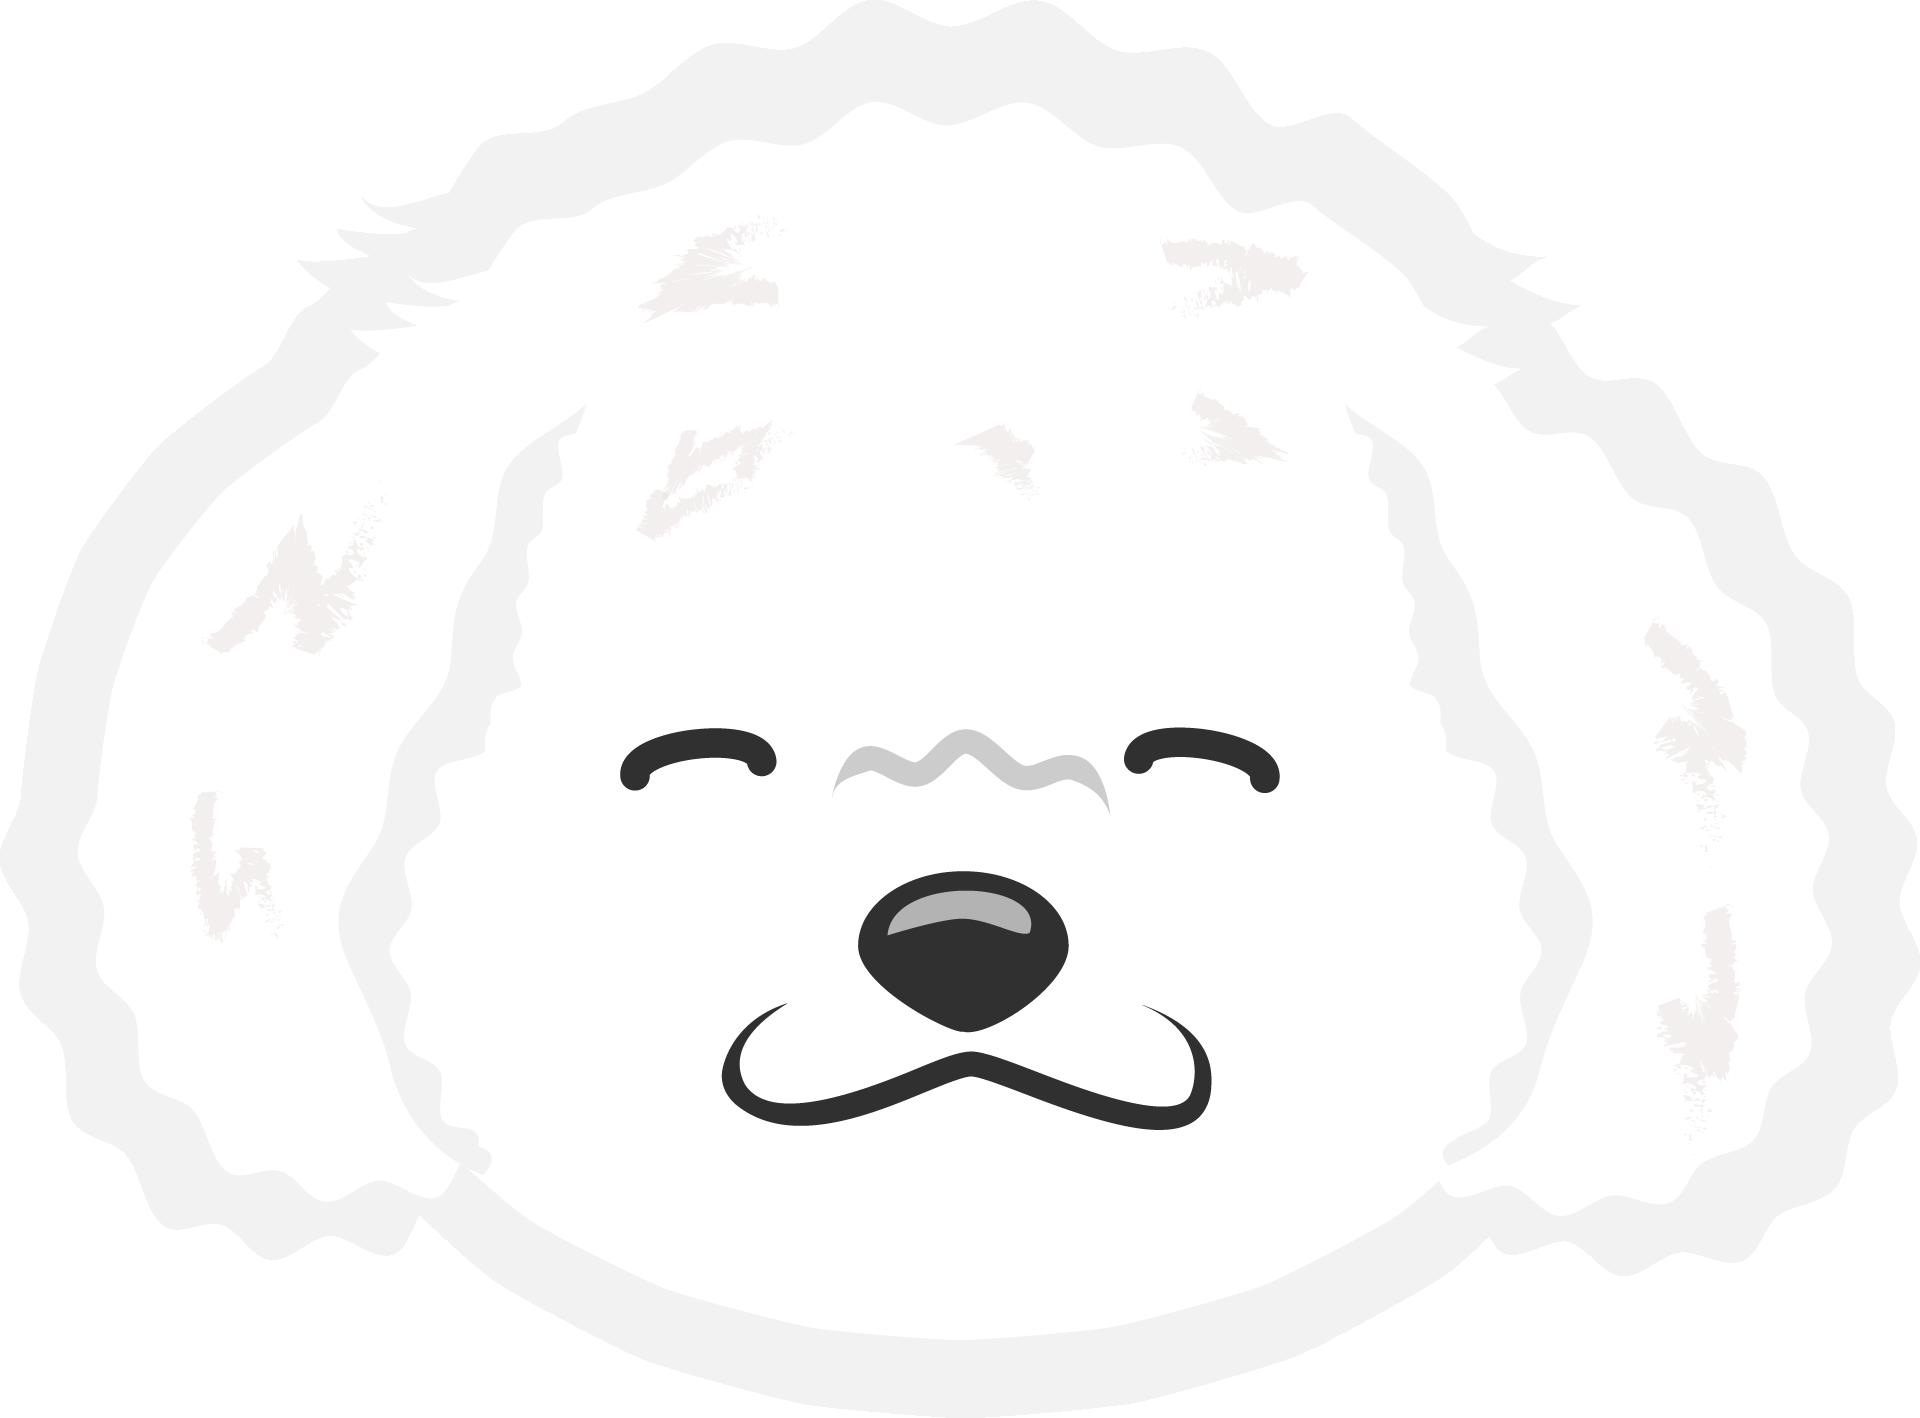 Картинка улыбающийся мордочки белого щенка